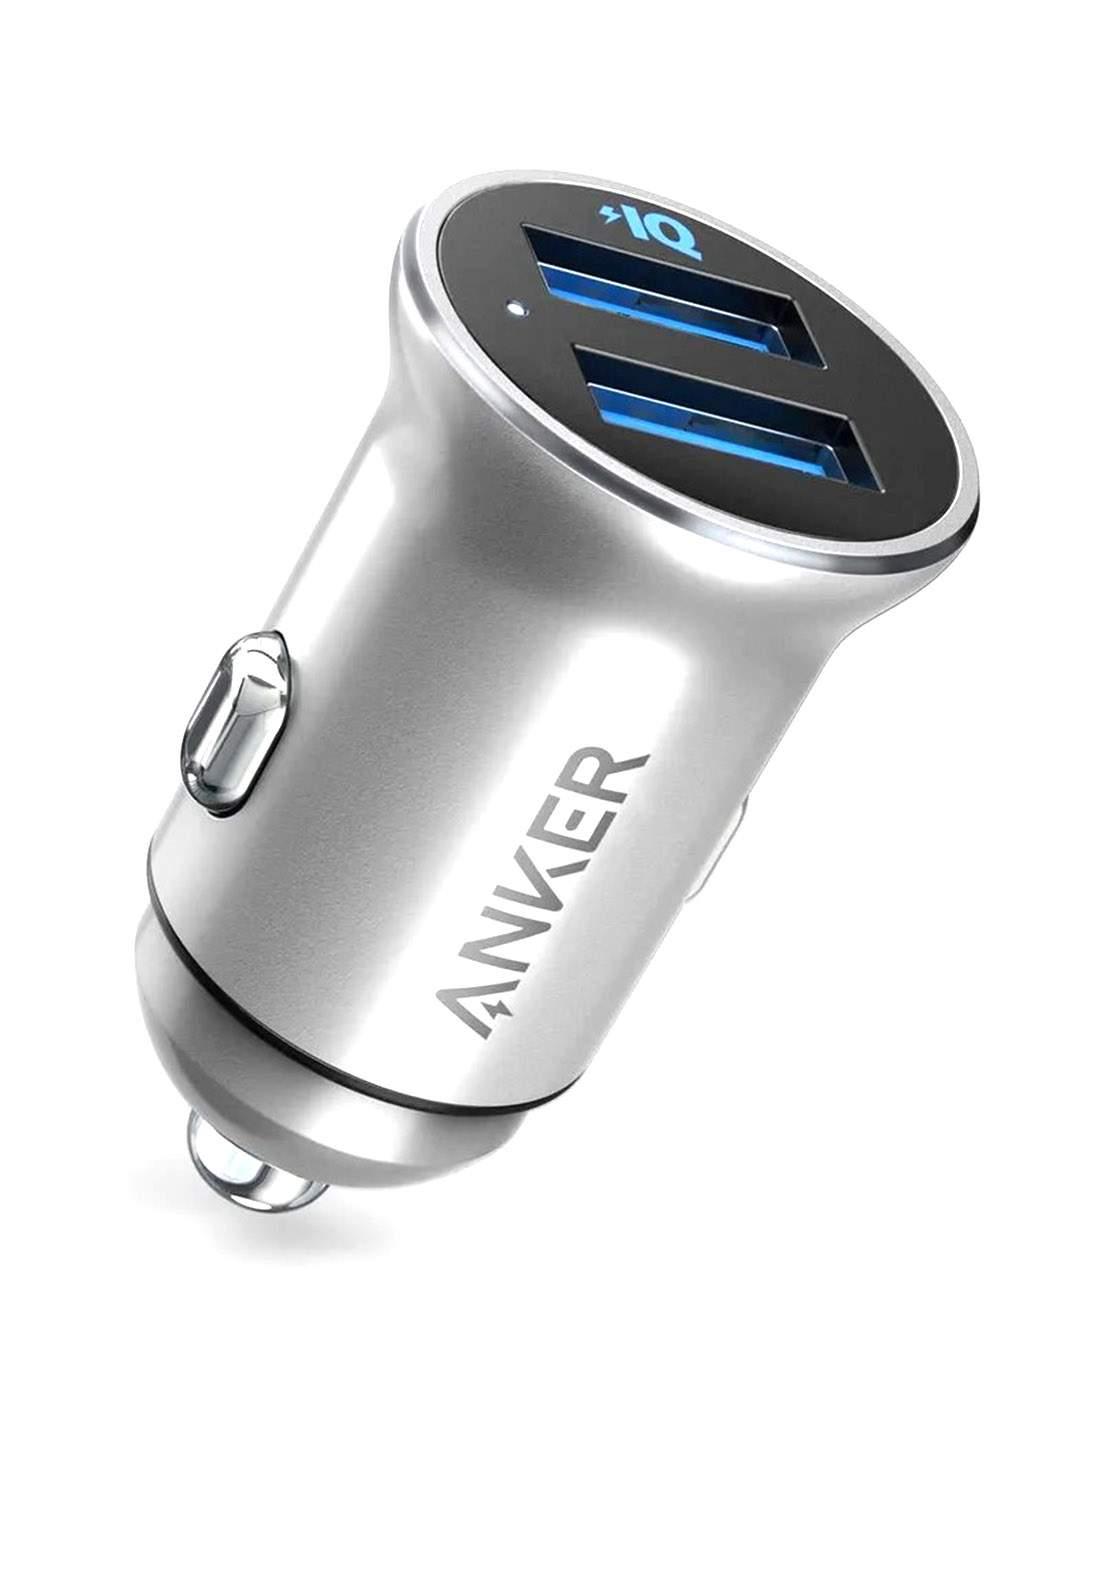 Anker A2727 Dual Port Power Drive 2 Alloy 24W Car Charger - Silver شاحن موبايل للسيارة